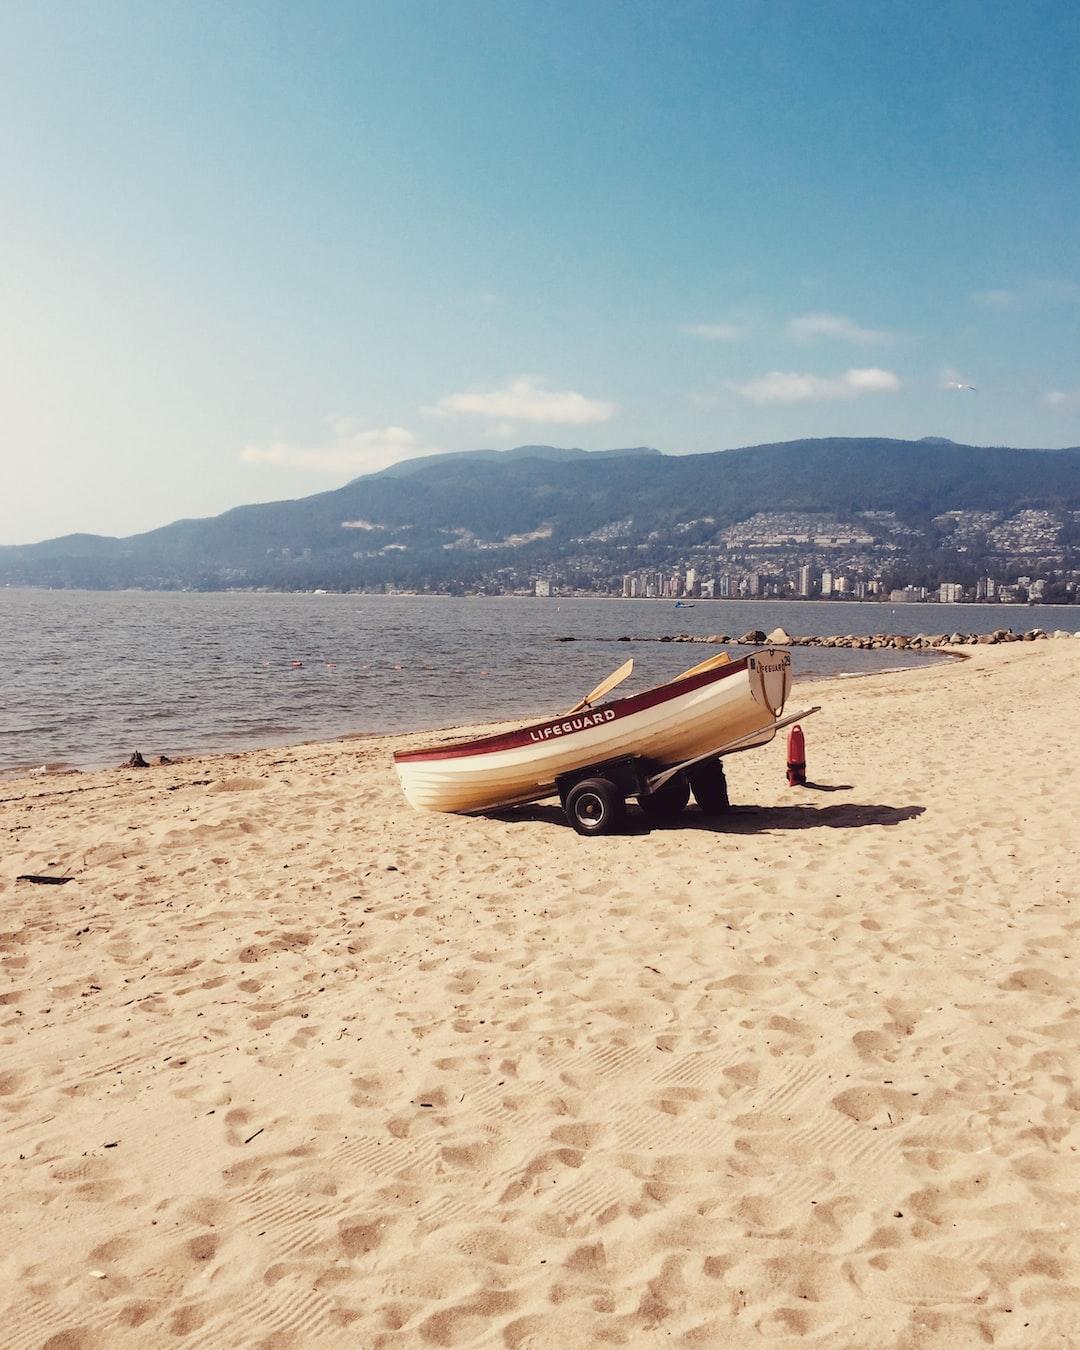 Lifeguard boat on beach